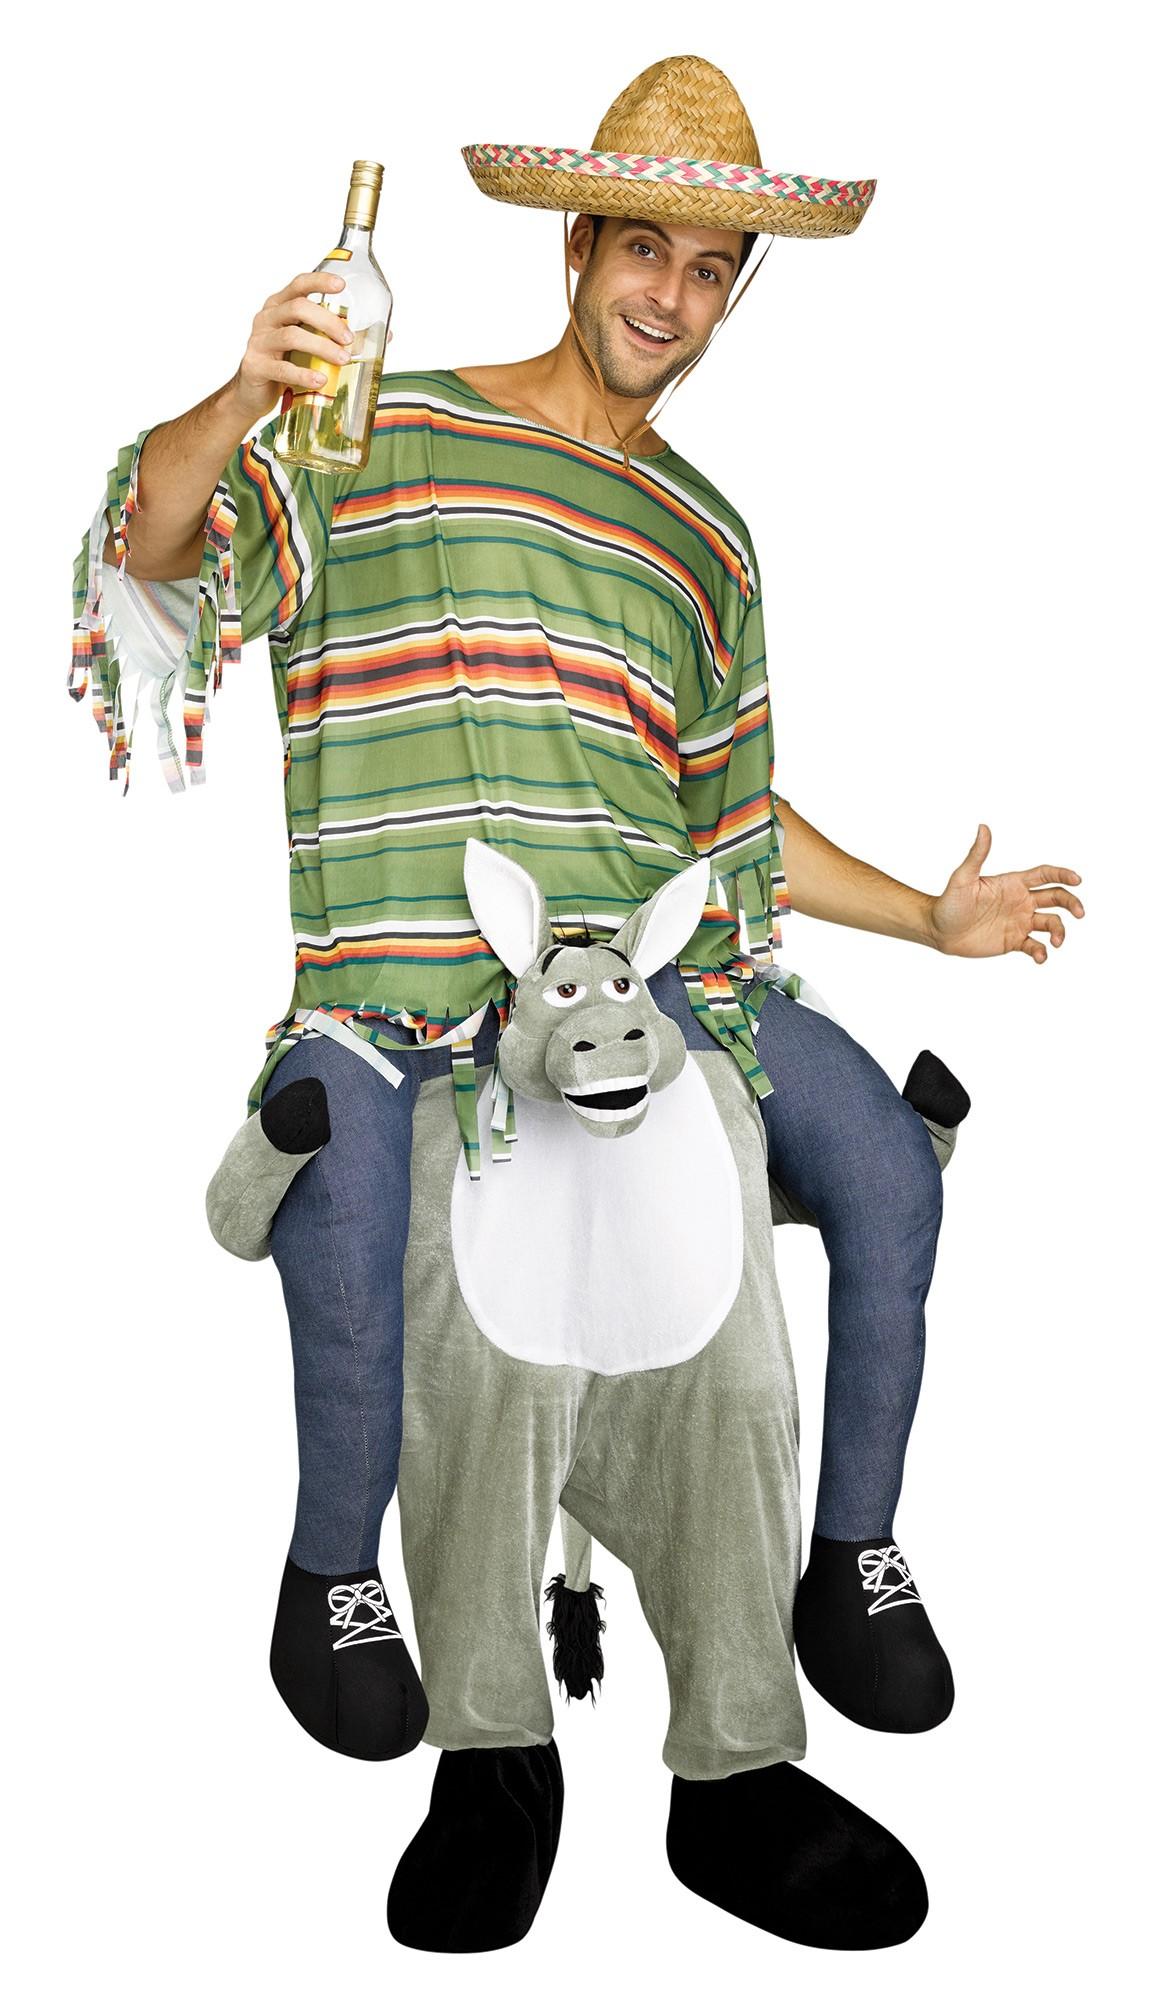 lustiges step  huckepack kostuem piggy  aufsitz